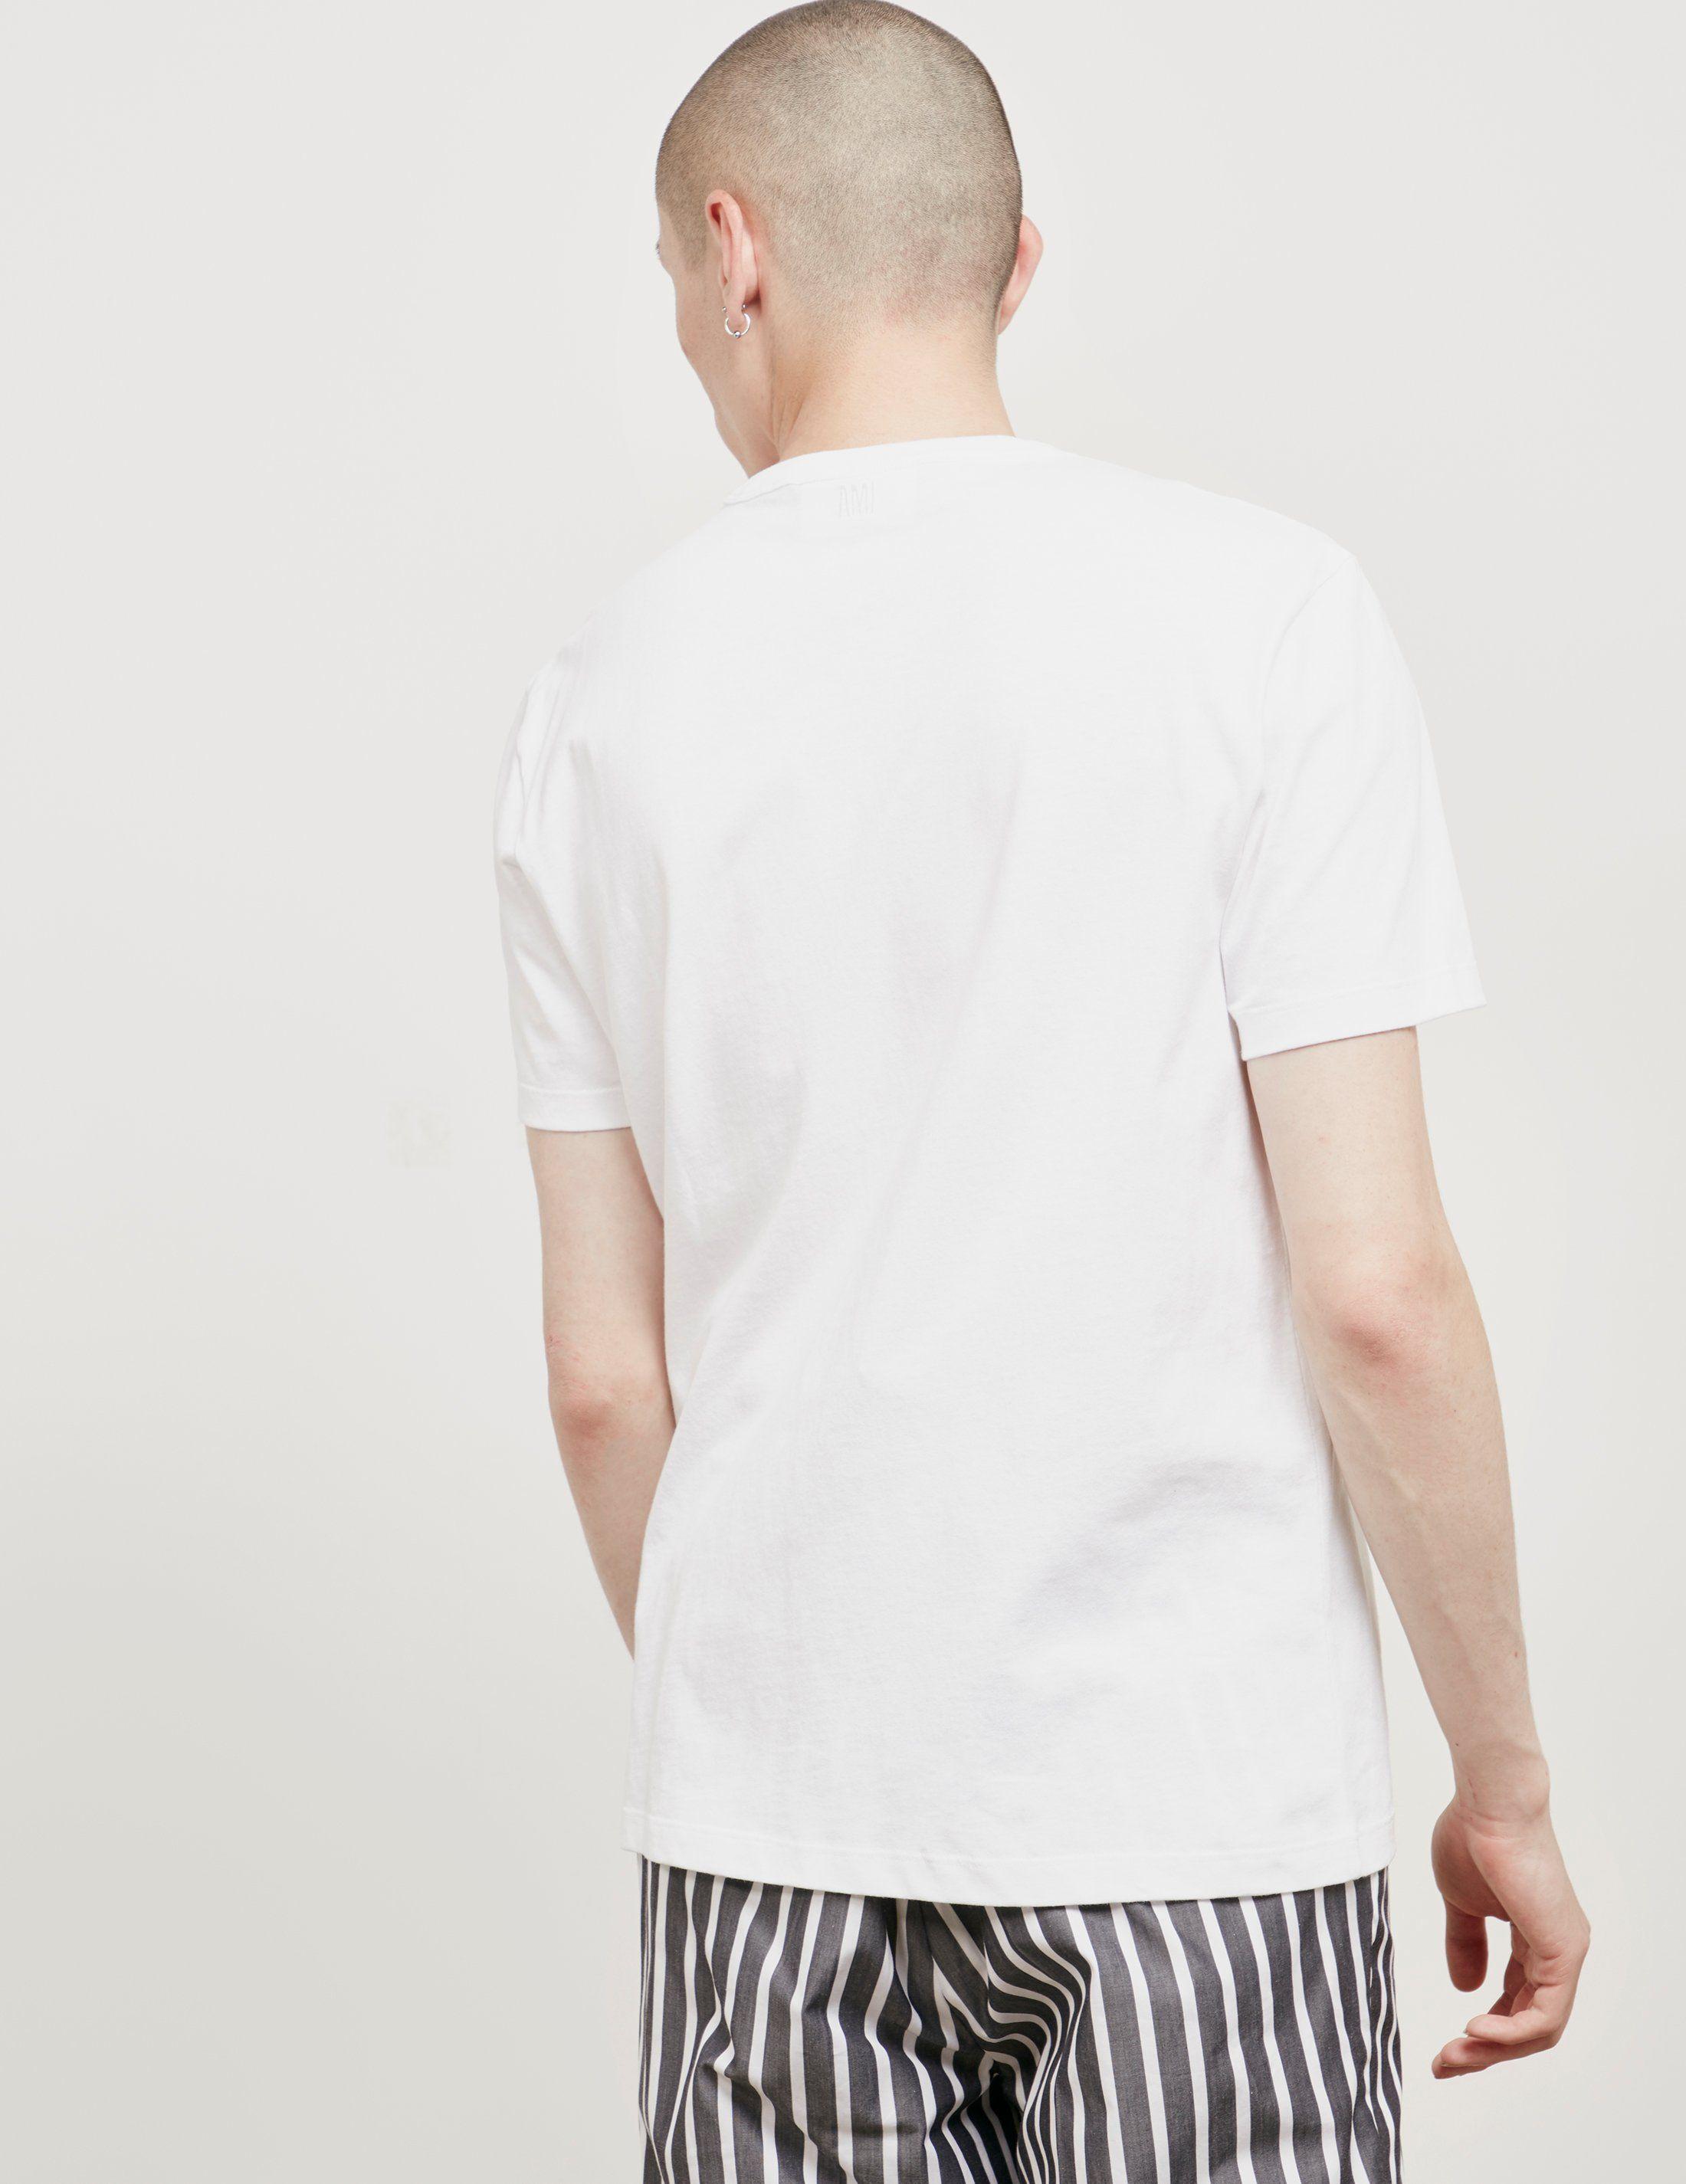 AMI Paris Here Short Sleeve T-Shirt - Online Exclusive